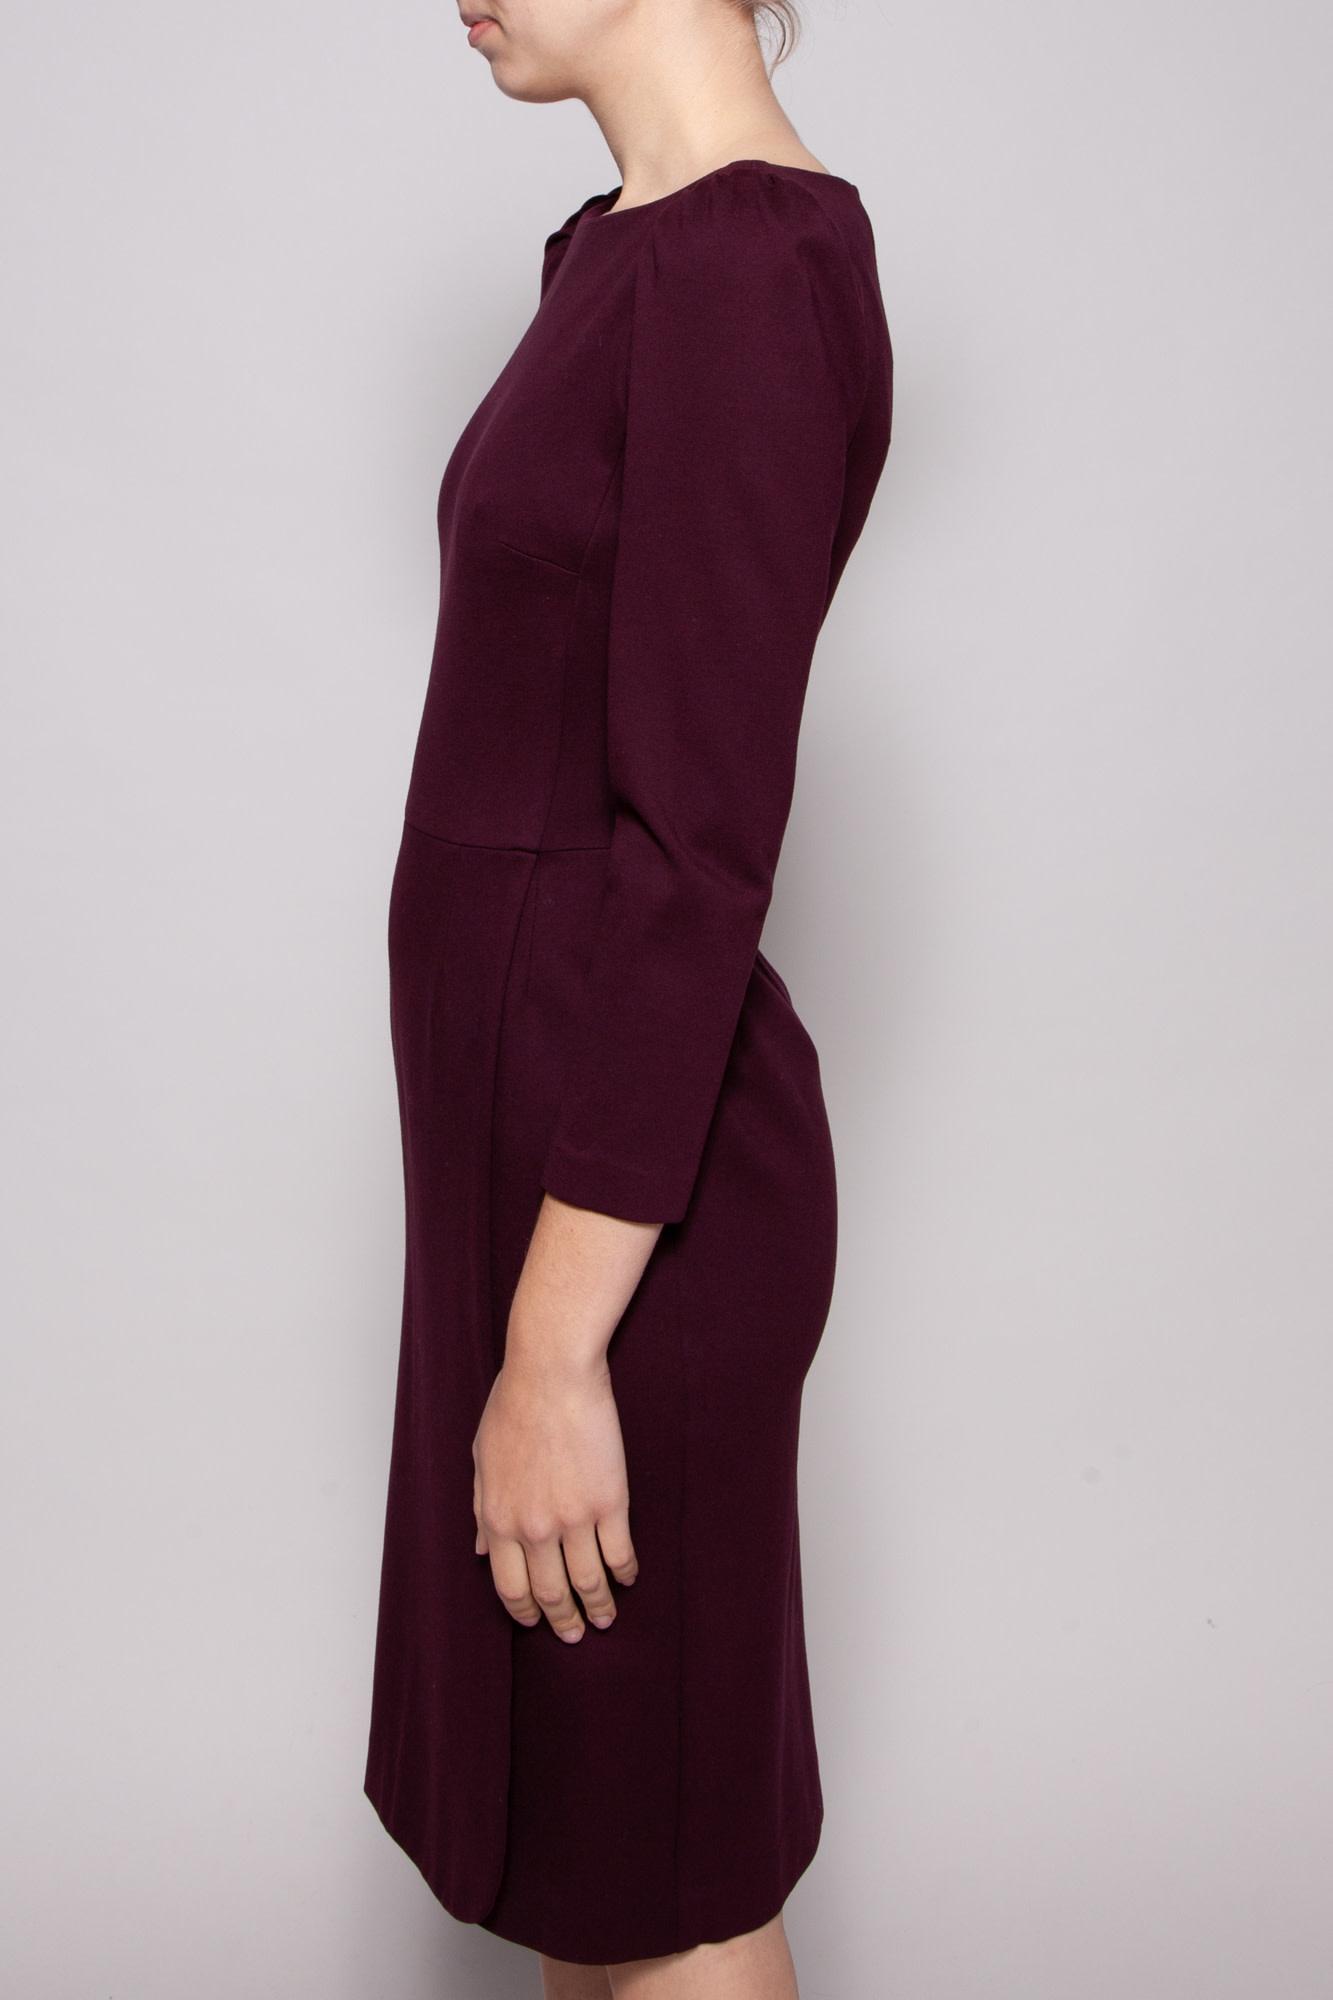 Éditions de Robes BURGUNDY DRESS